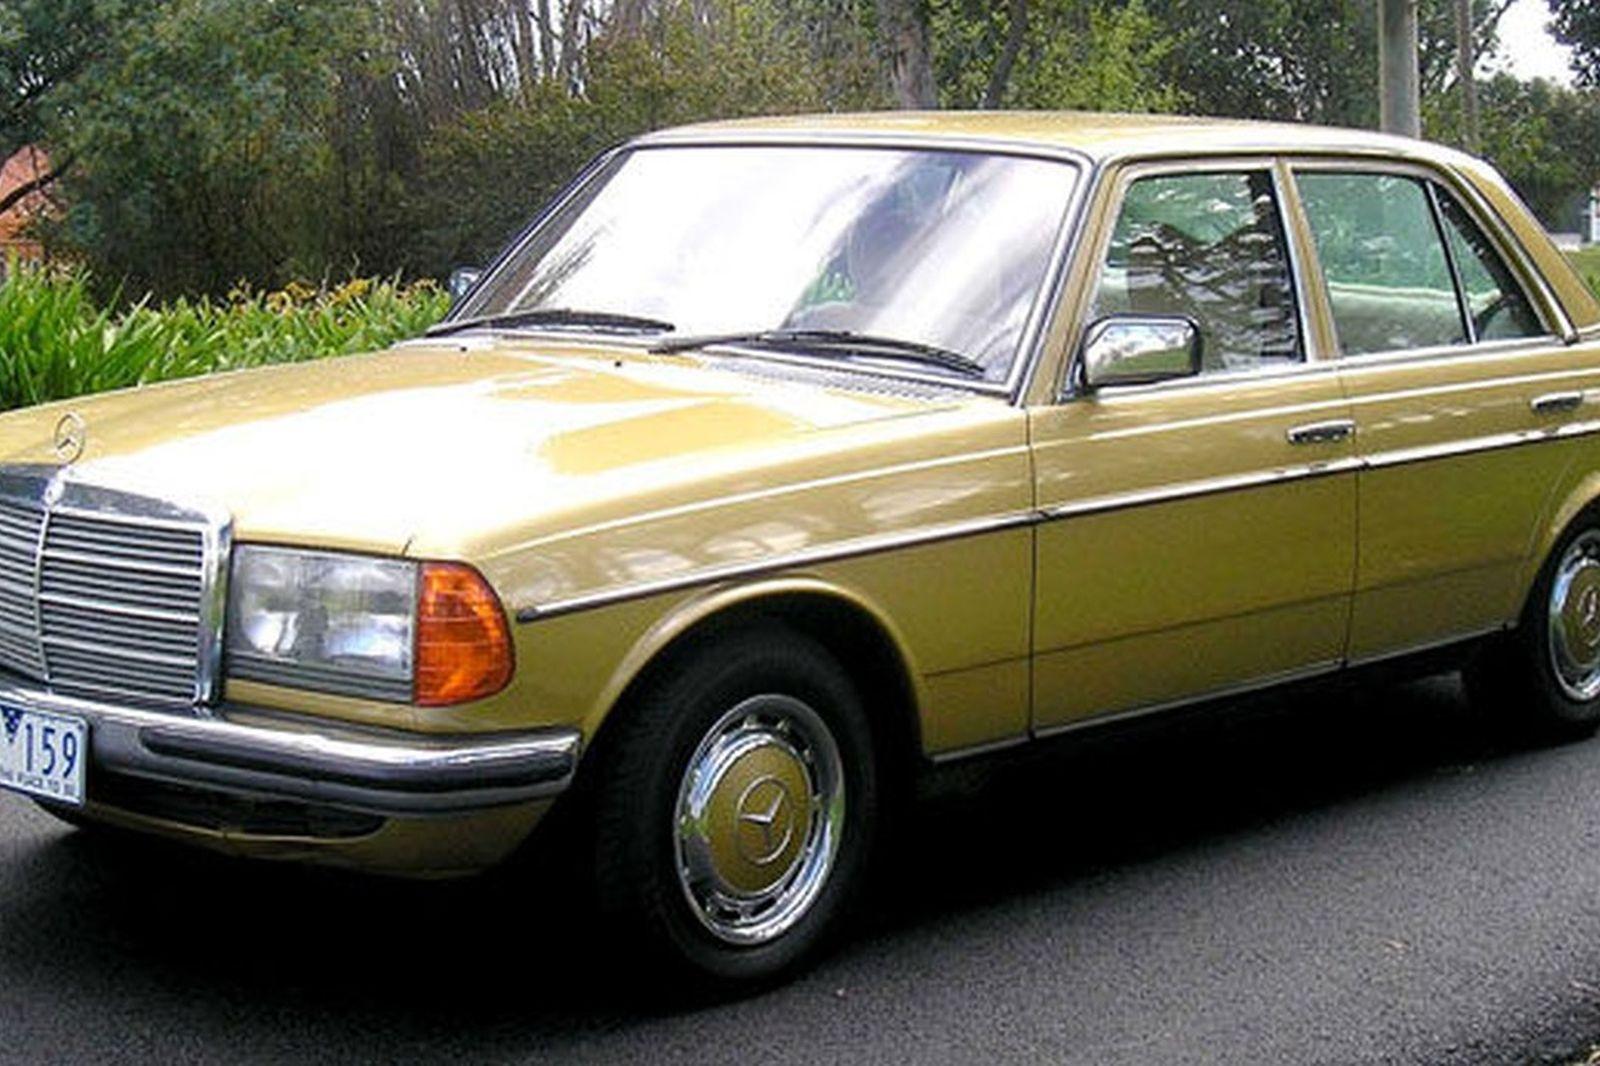 e149270bcf Sold  Mercedes-Benz 280E Sedan Auctions - Lot 28 - Shannons